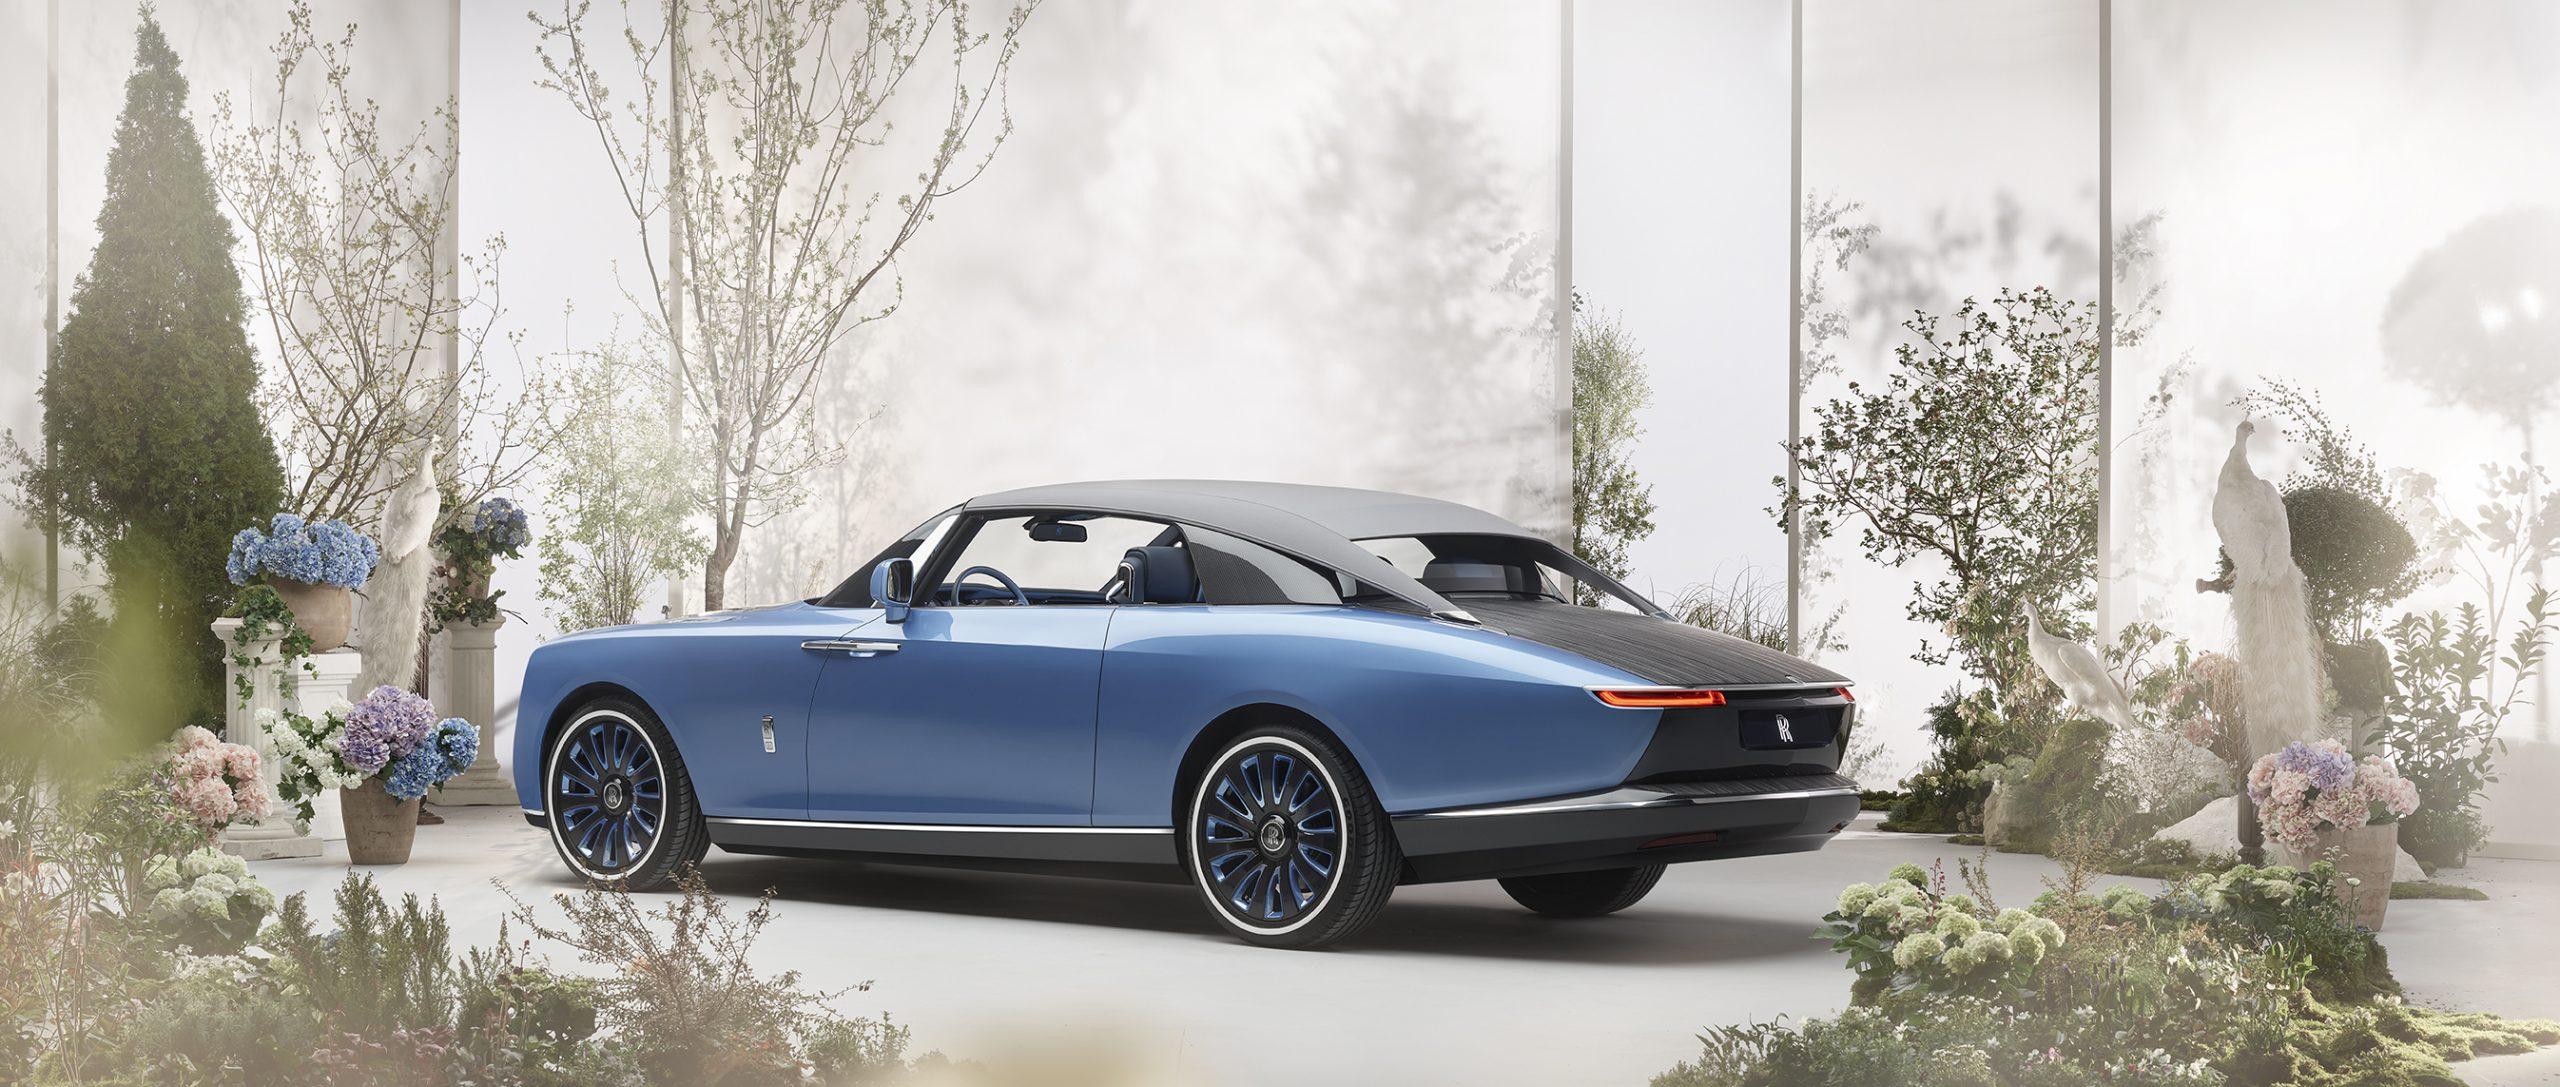 Rolls-RoyceBoatTailRear3_4FixedCanopyLifestyle